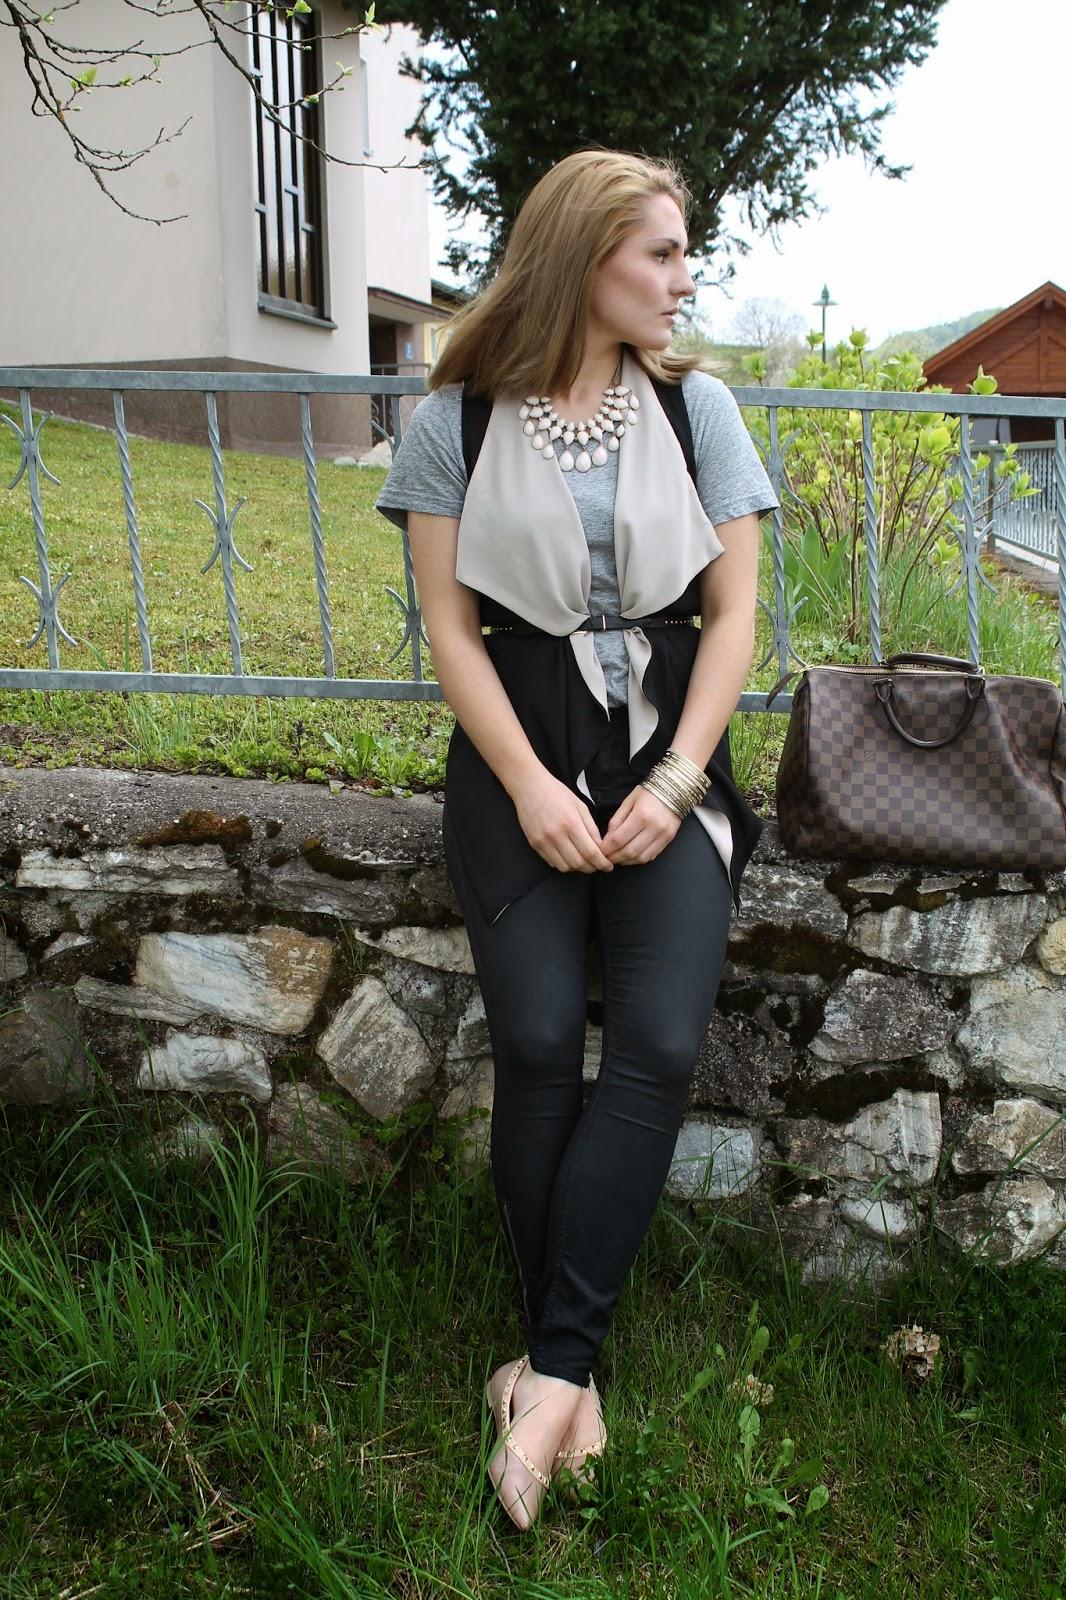 Fashionblogger Österreich / Austria / Kärnten / Carinthia / Klagenfurt / Köttmannsdorf / Blogger / Streetstyle / Bloggerstyle / Spring 2014 / Black Vest / Skinny waxed Jeans / Statement Necklace / Studded Flats / Forever 21 / Louis Vuitton Speedy Damier Ebene / H&M / Persunmall /